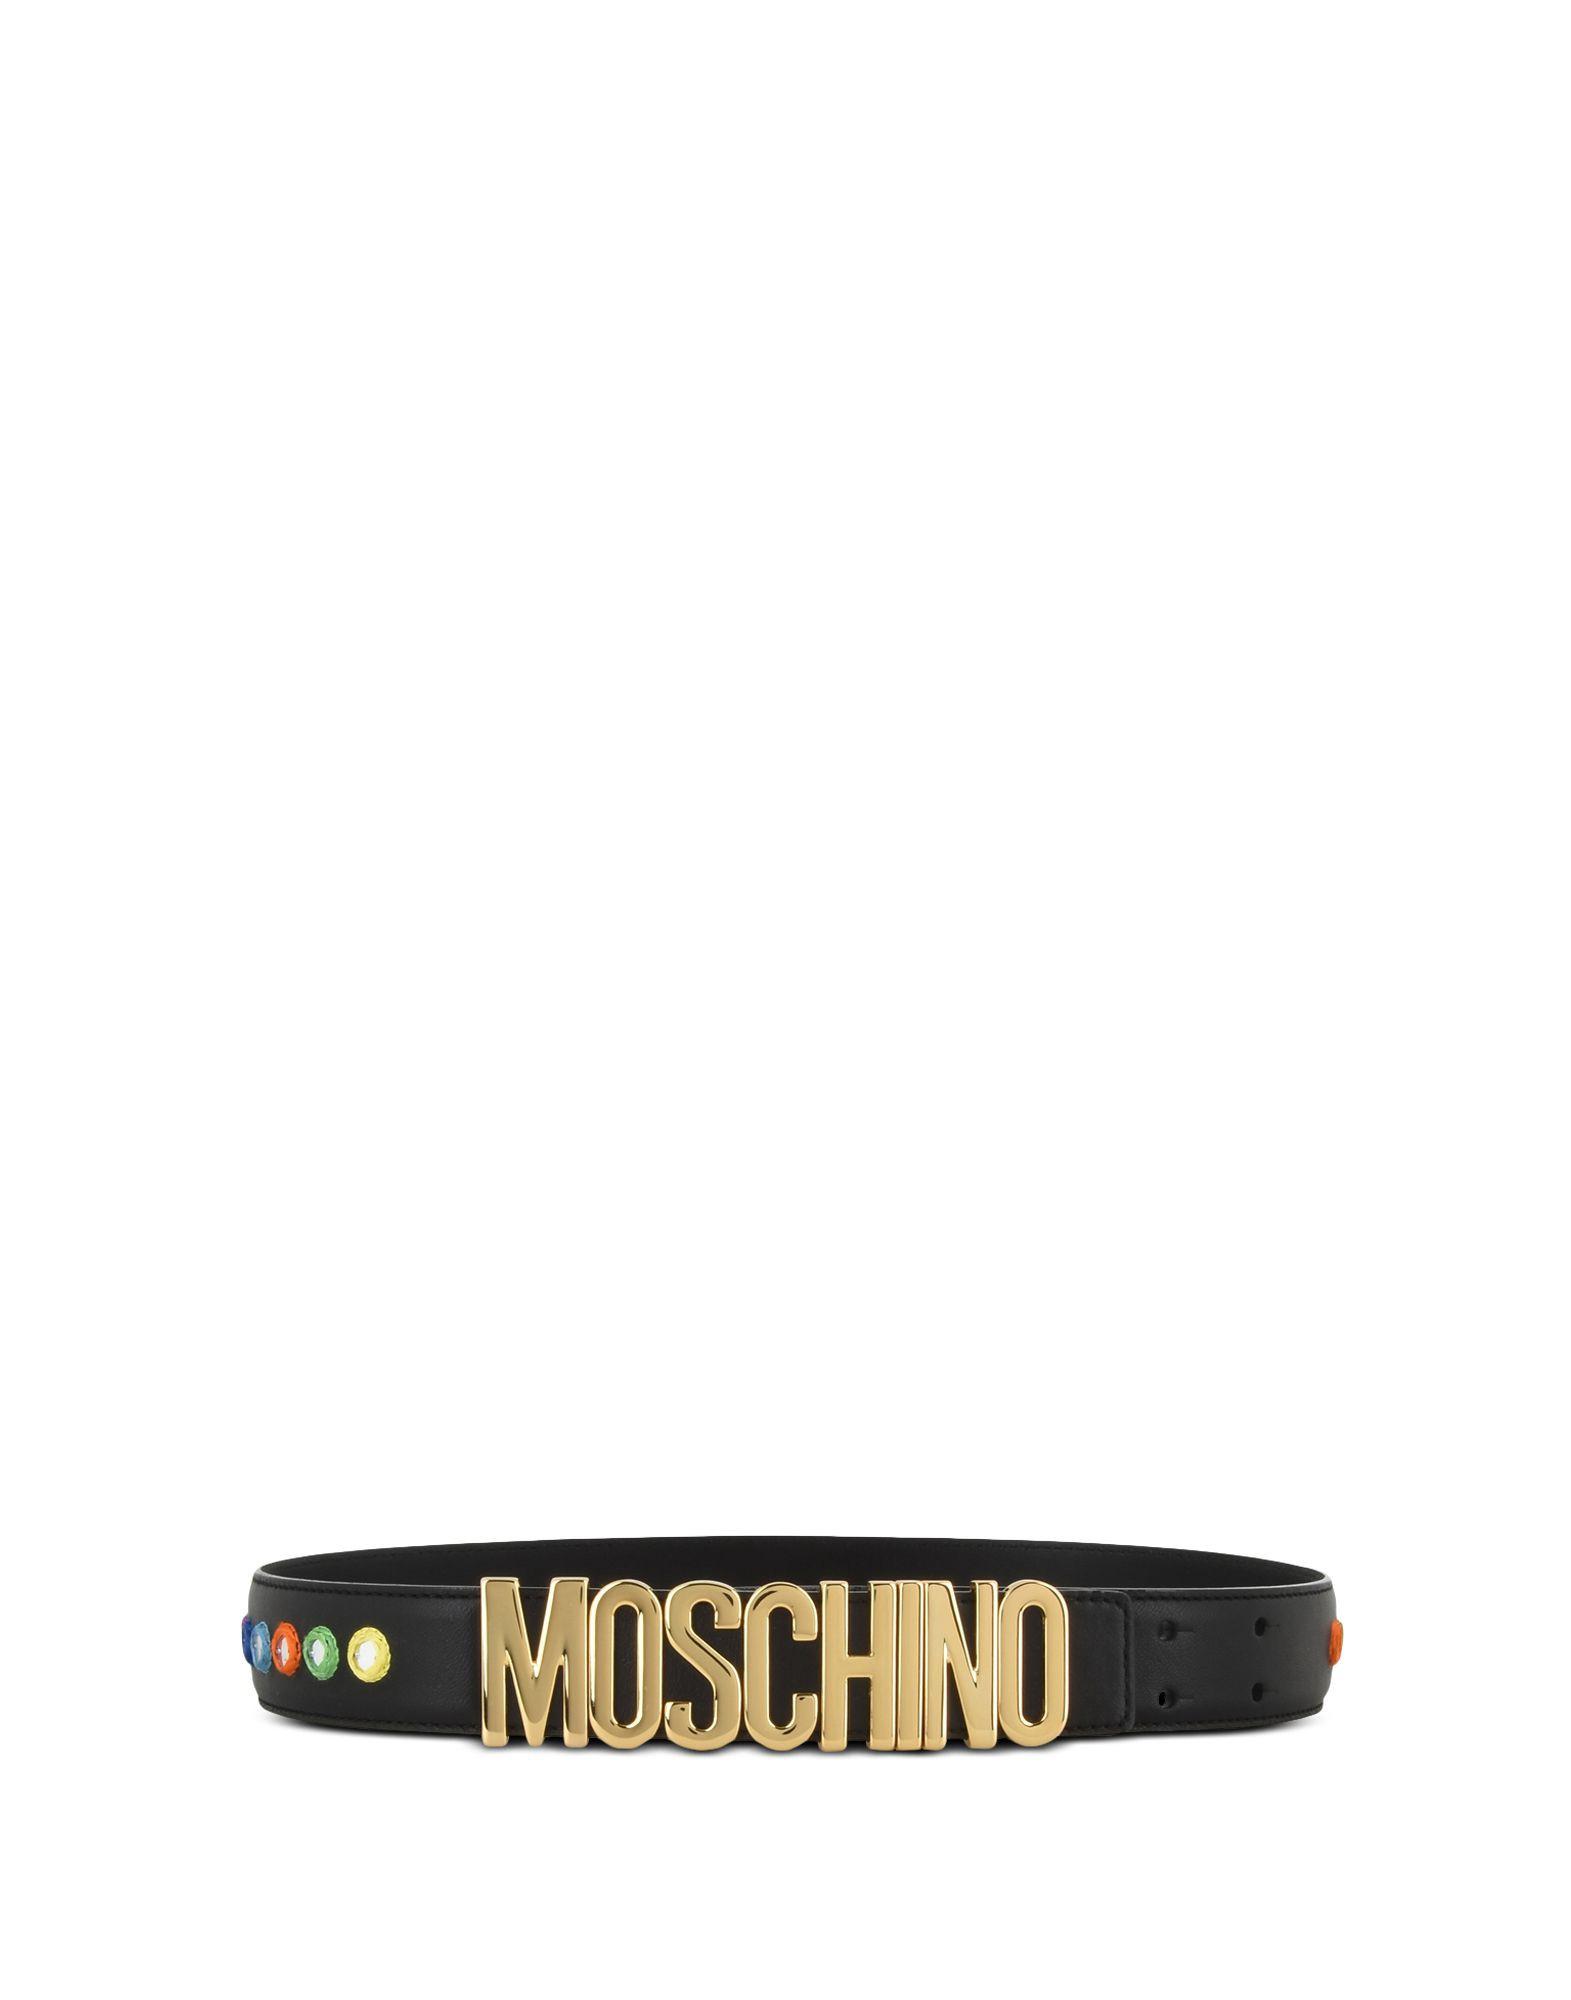 MOSCHINO Embroidered Mirror Logo Belt in Black